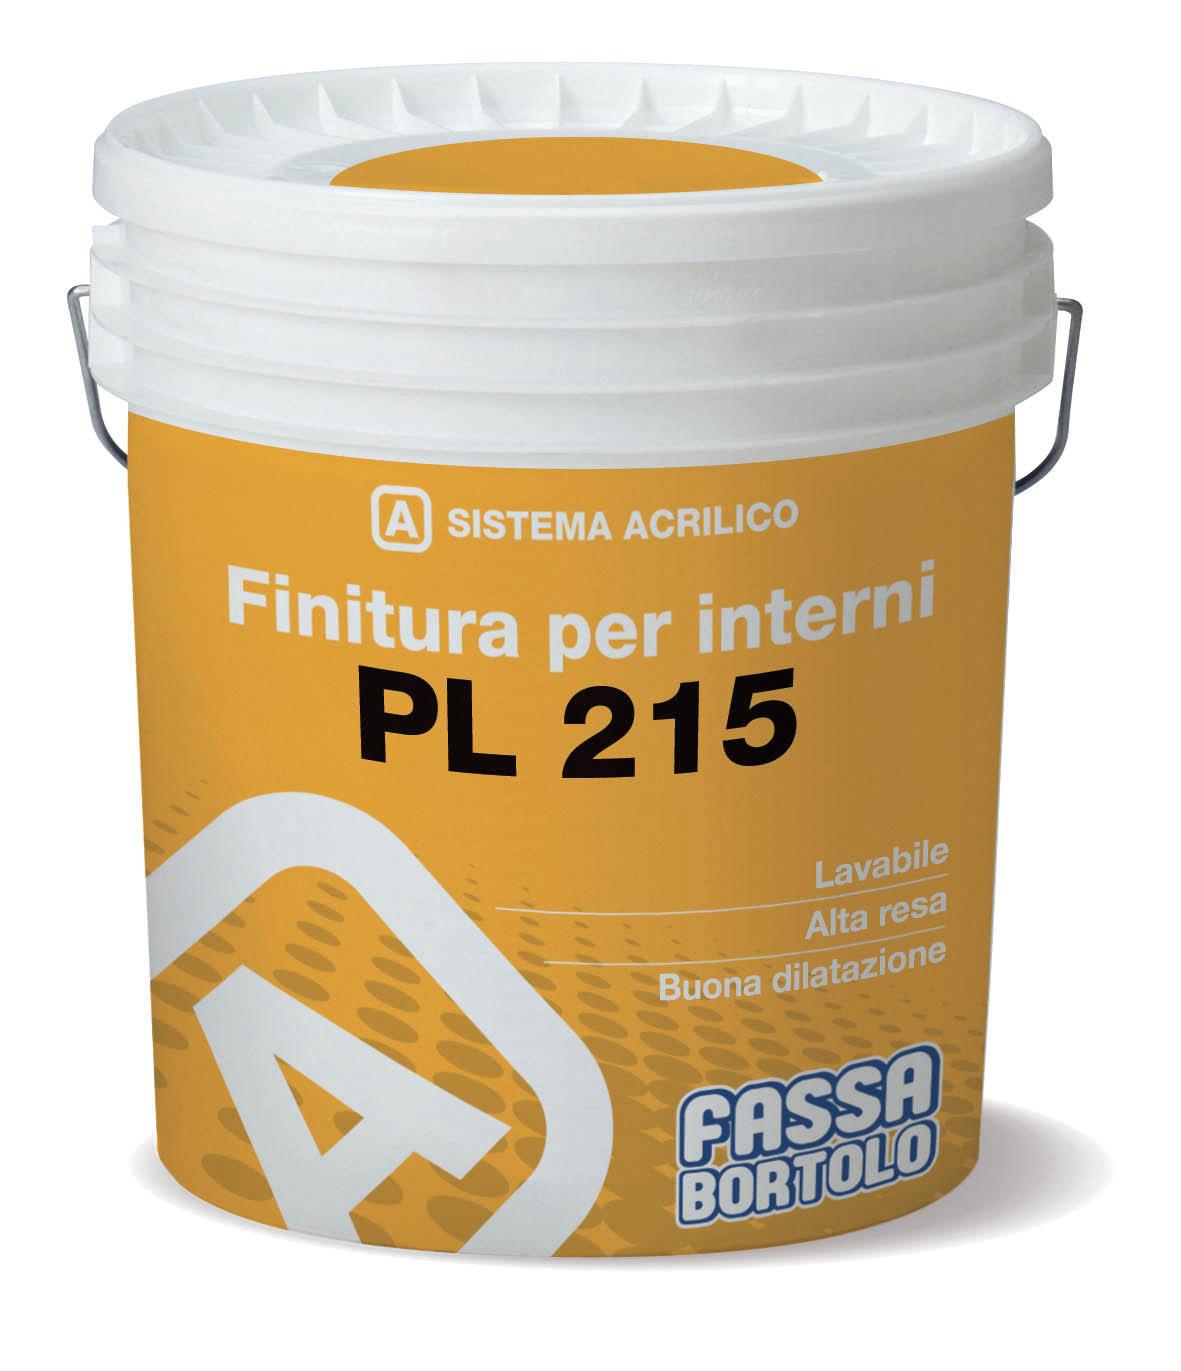 PL 215